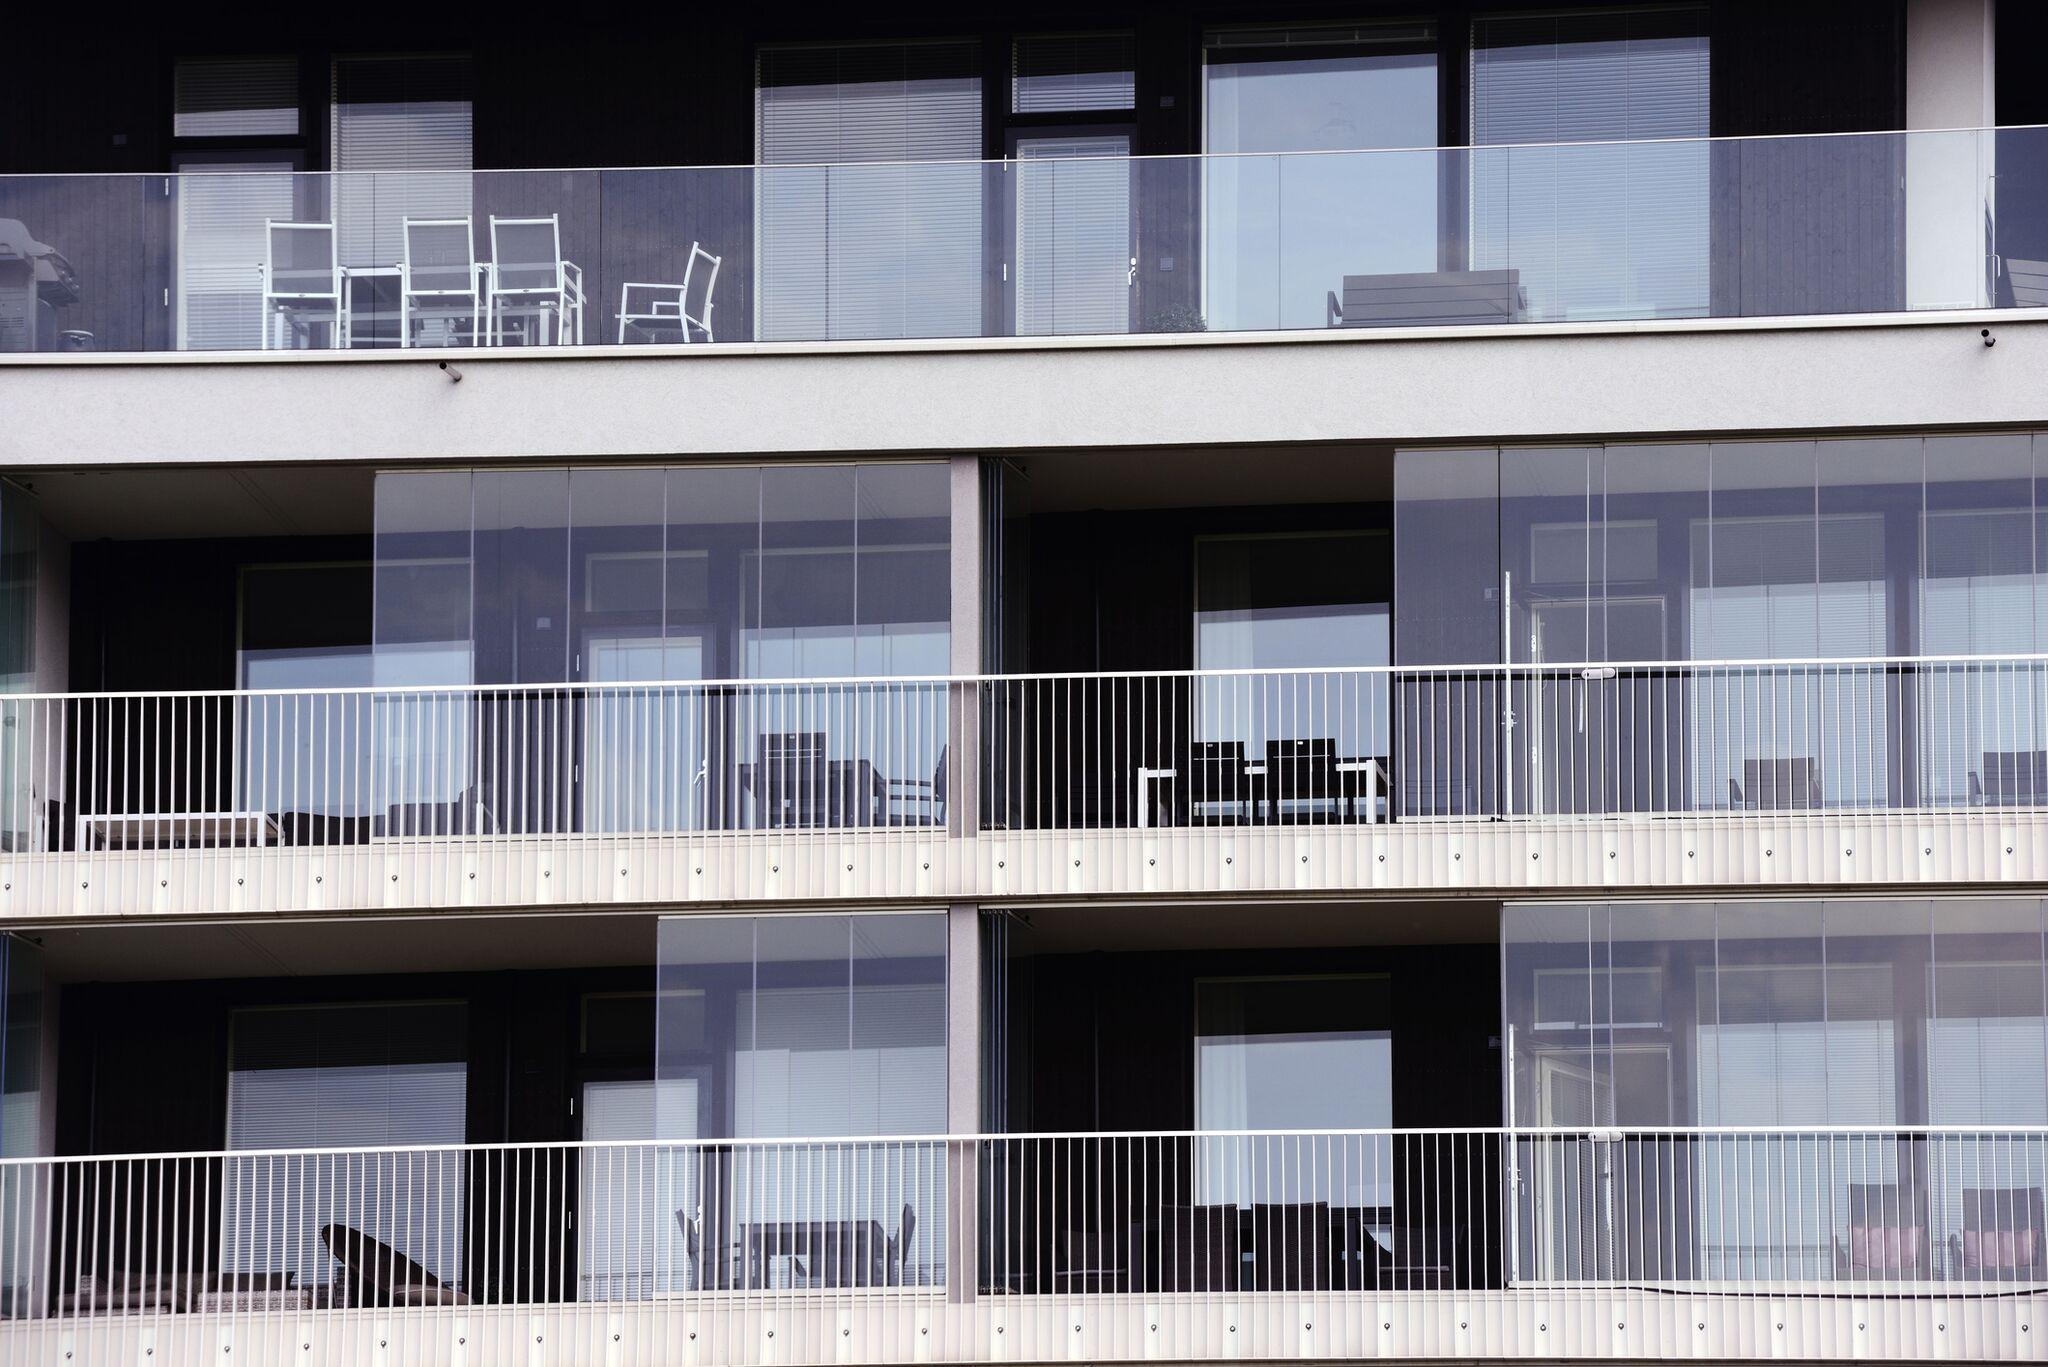 Квартира в строящемся доме в Берлине